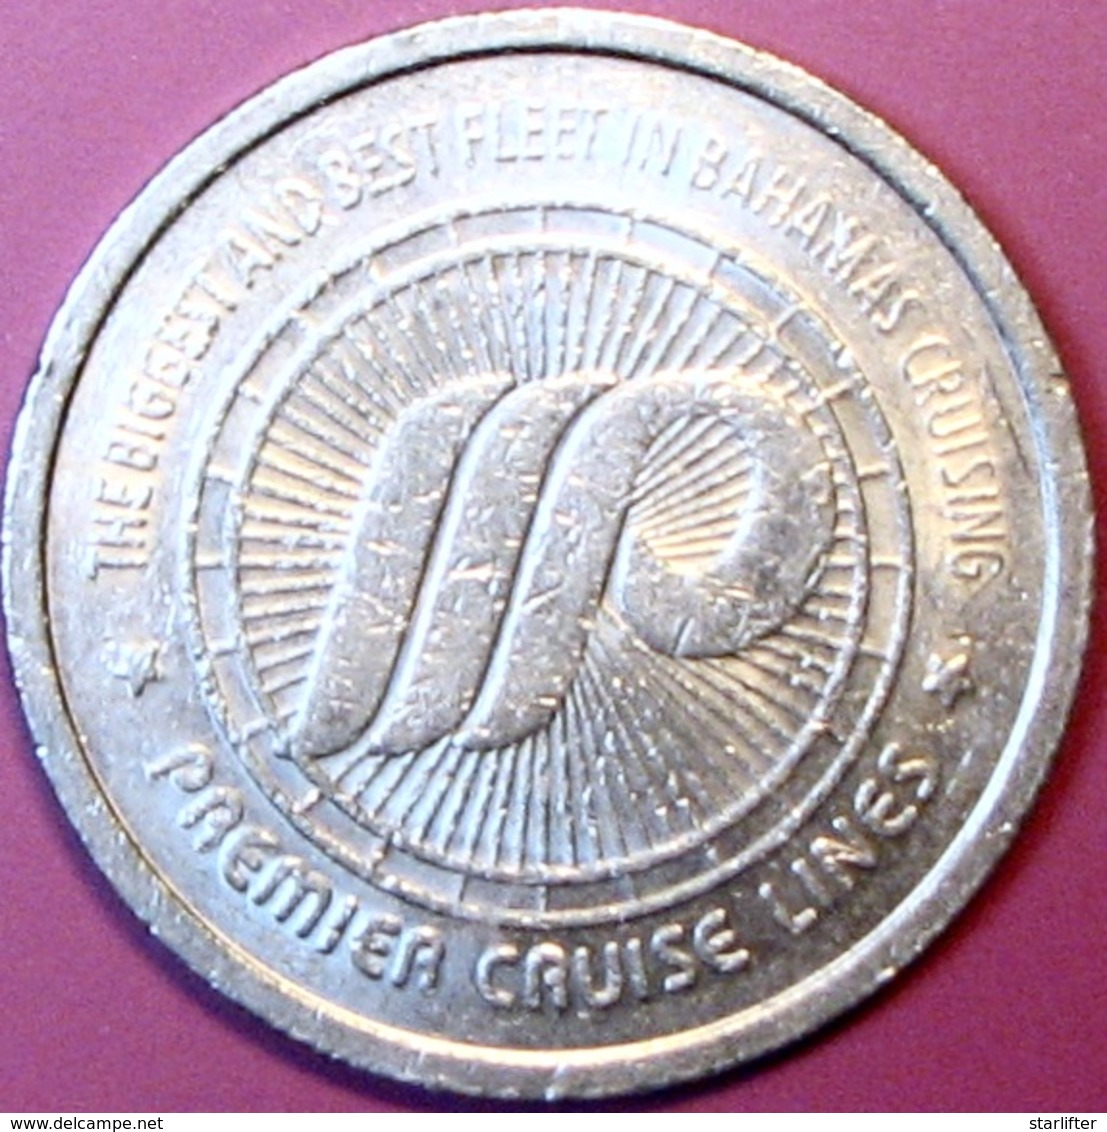 $1 Casino Token. Premier Cruise Line. D83. - Casino